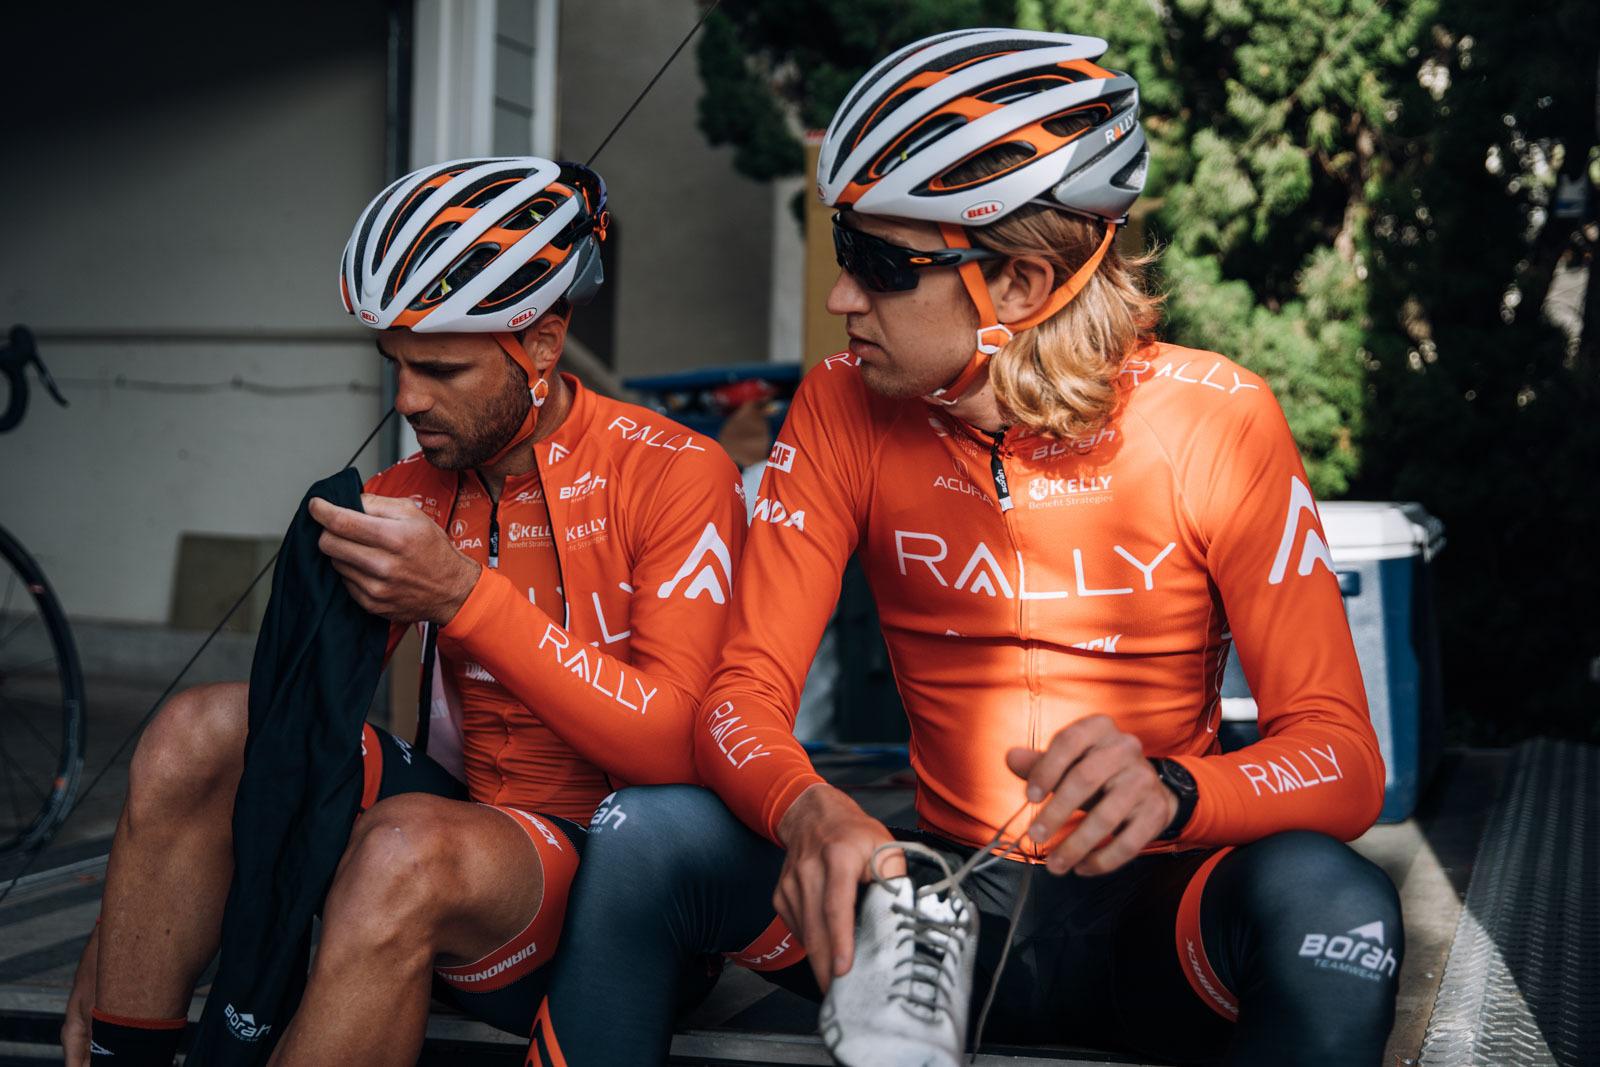 Bike-clothing-leg-warmers.jpg#asset:66390